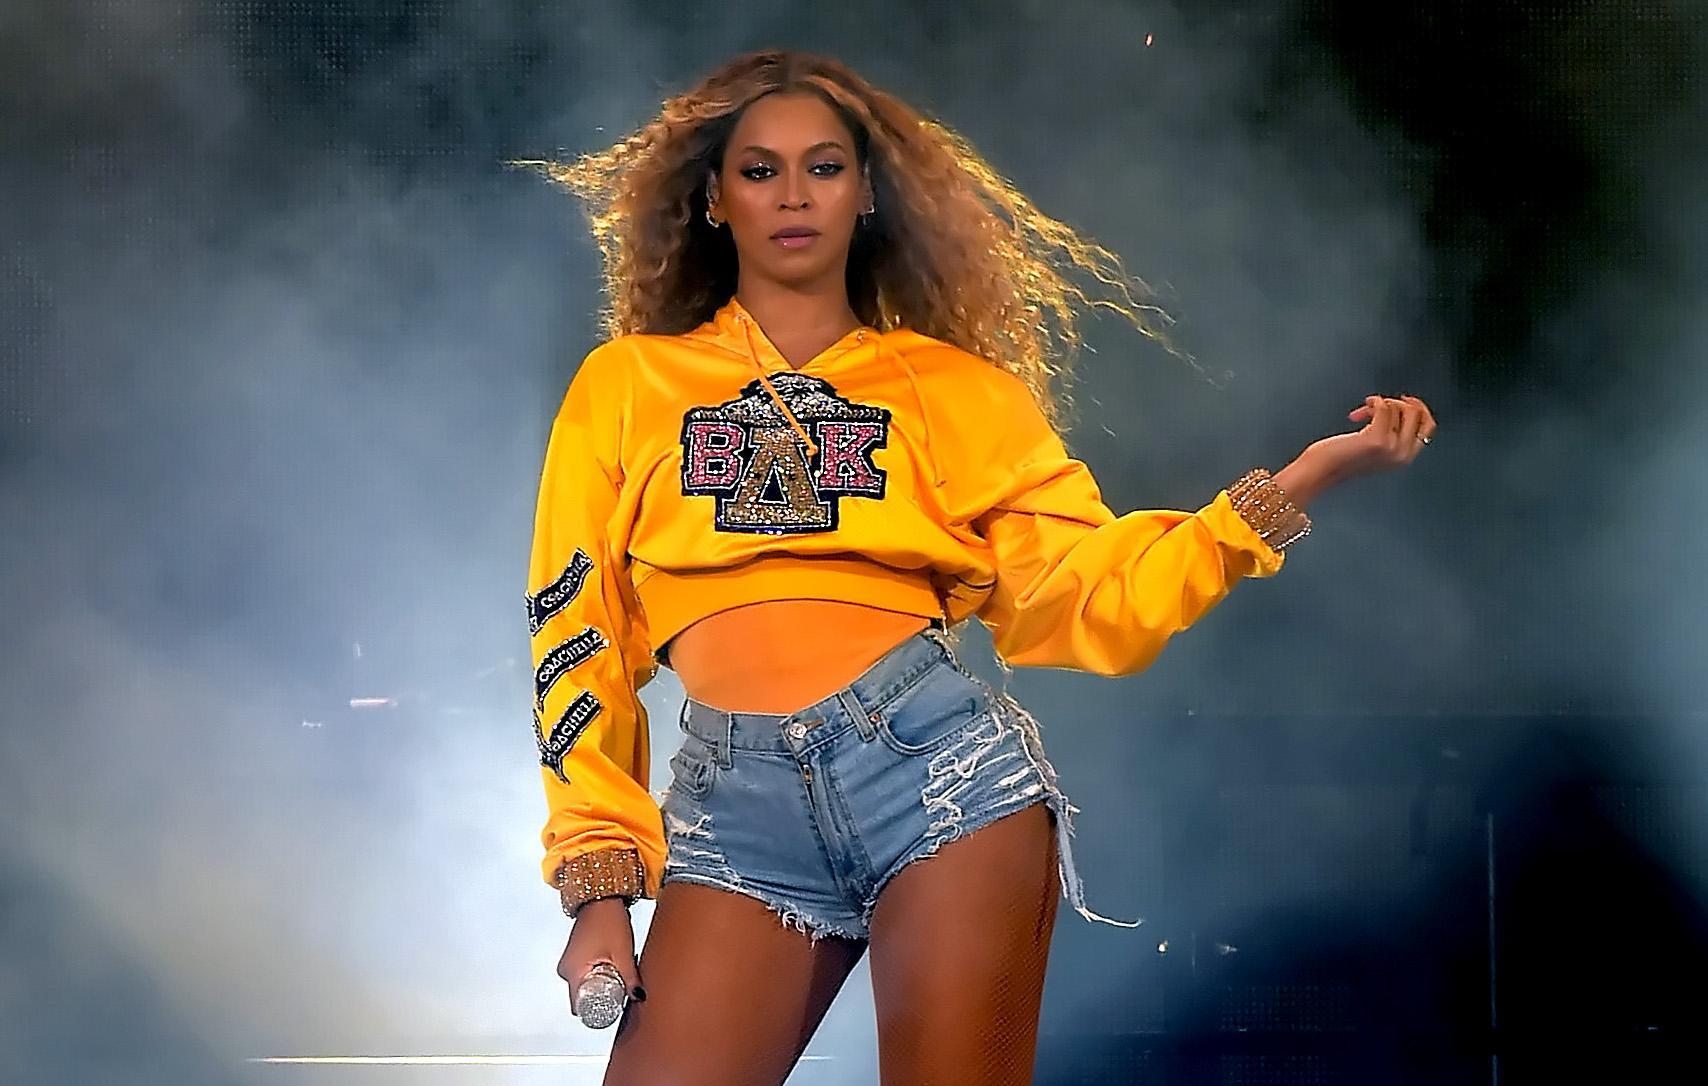 Beyoncés Message About Body Acceptance Is Pretty Powerful pictures